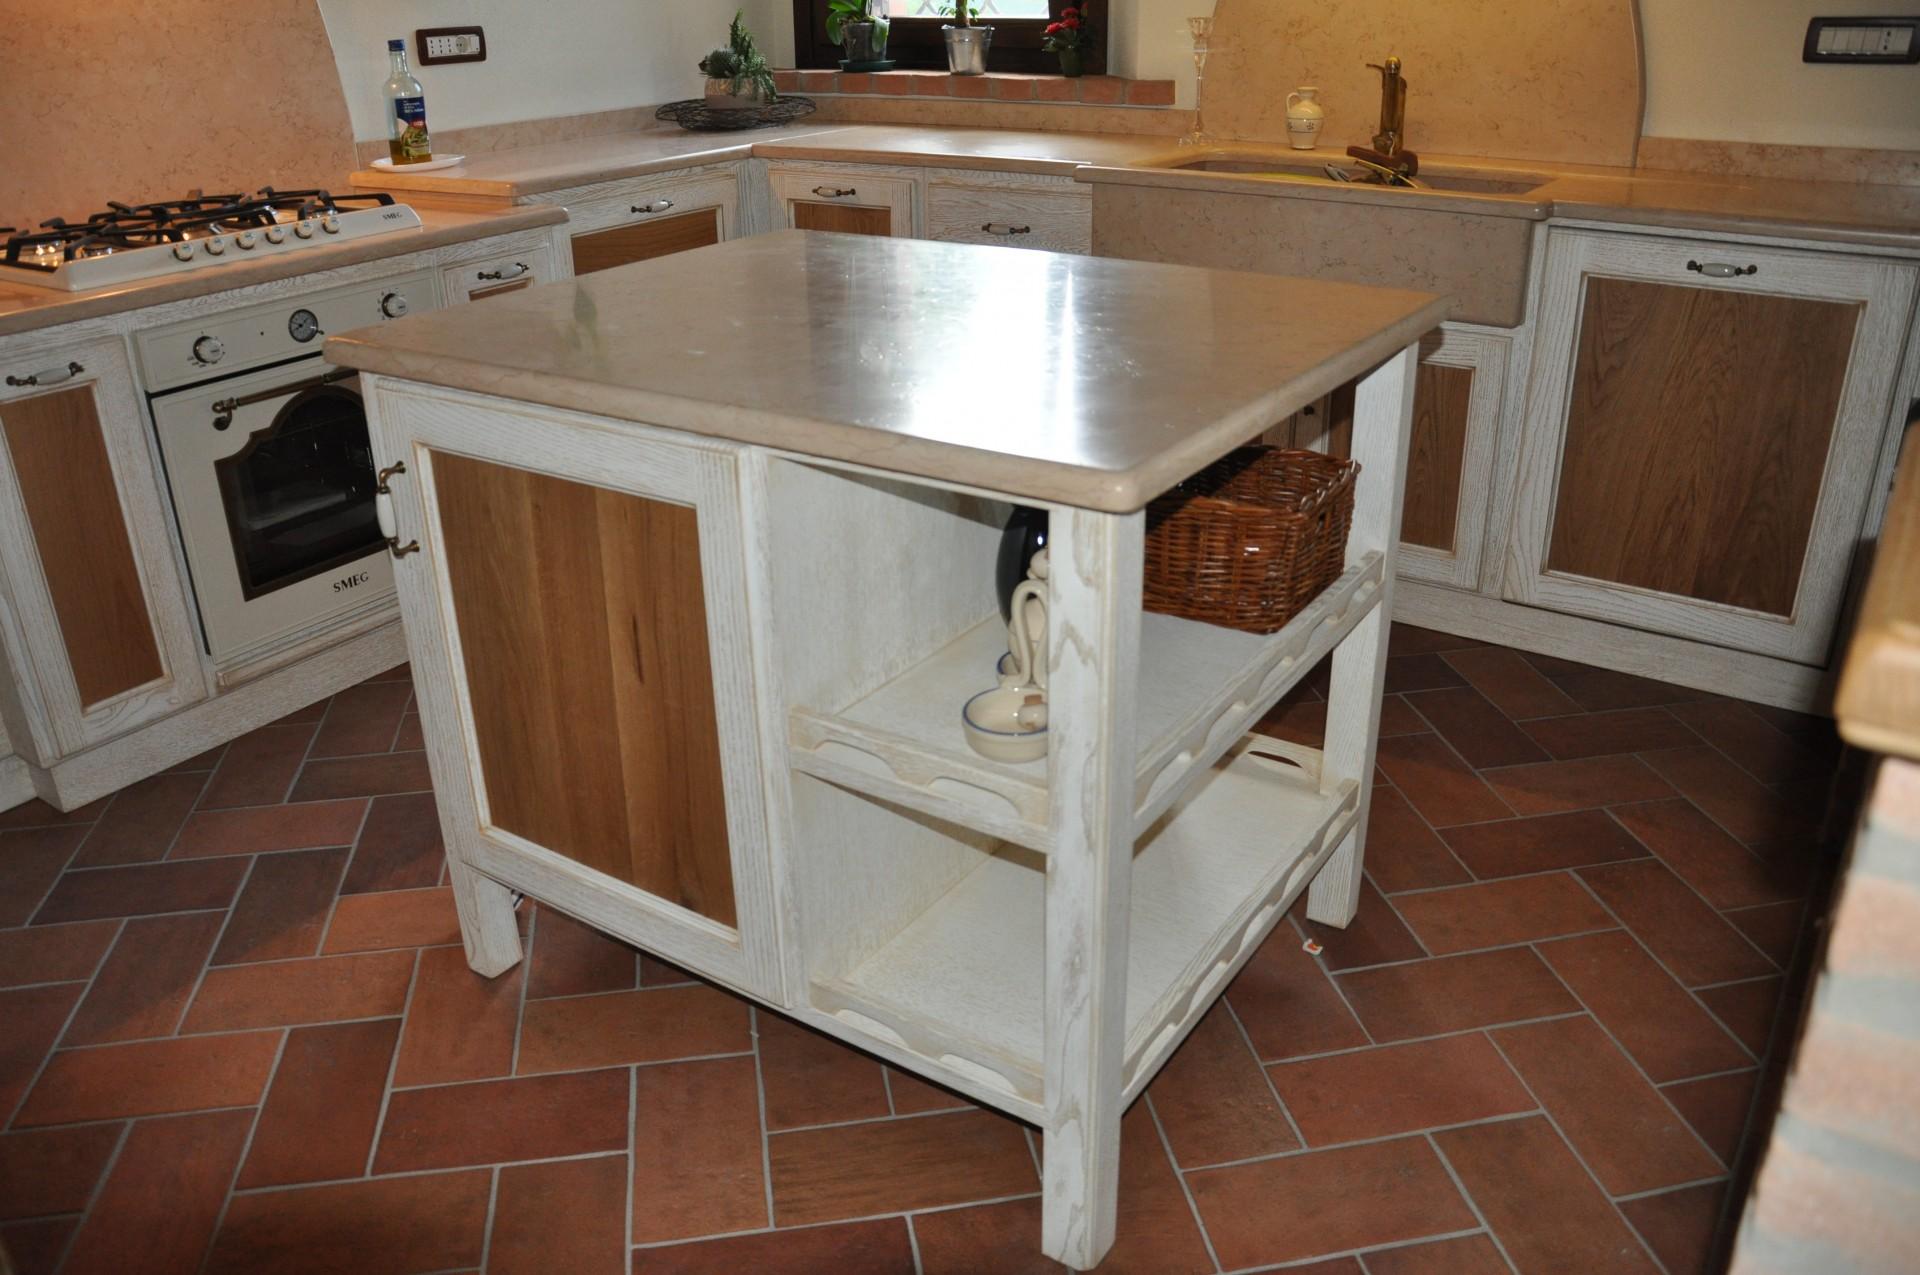 isola per cucina art 6011 isola per cucina costruita in legno su ...